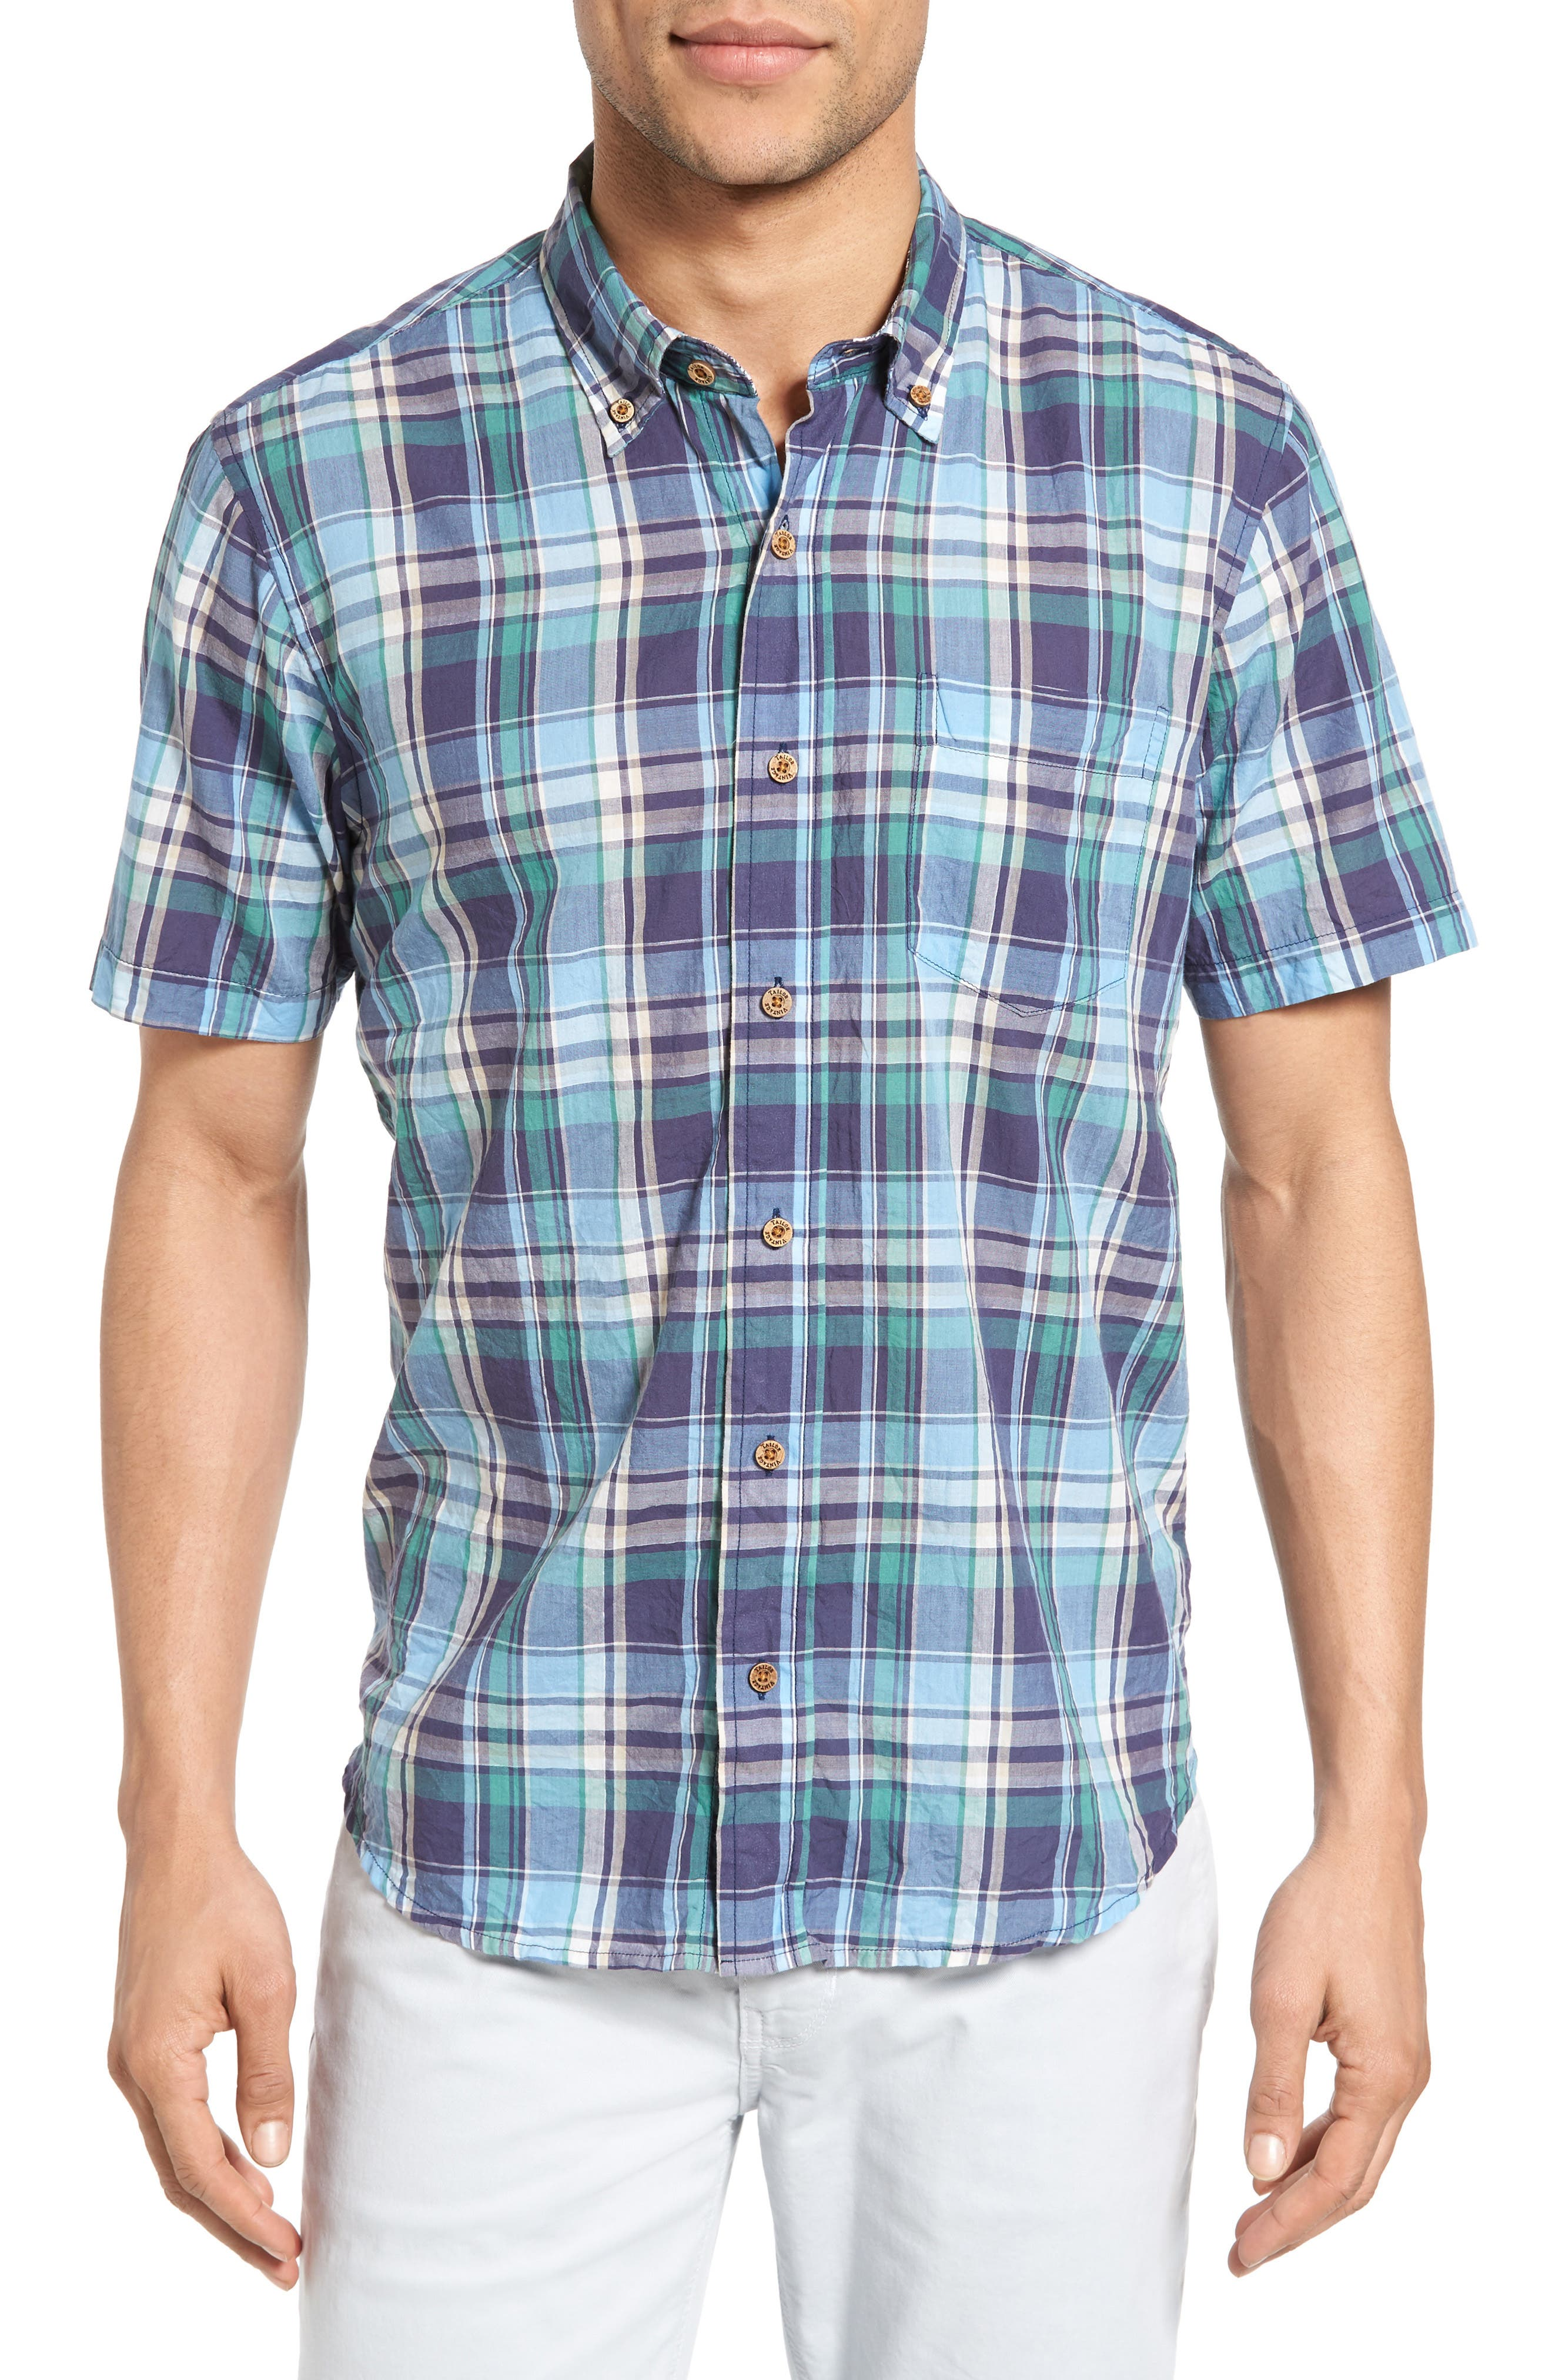 TAILOR VINTAGE Crinkle Plaid Sport Shirt, Main, color, 424